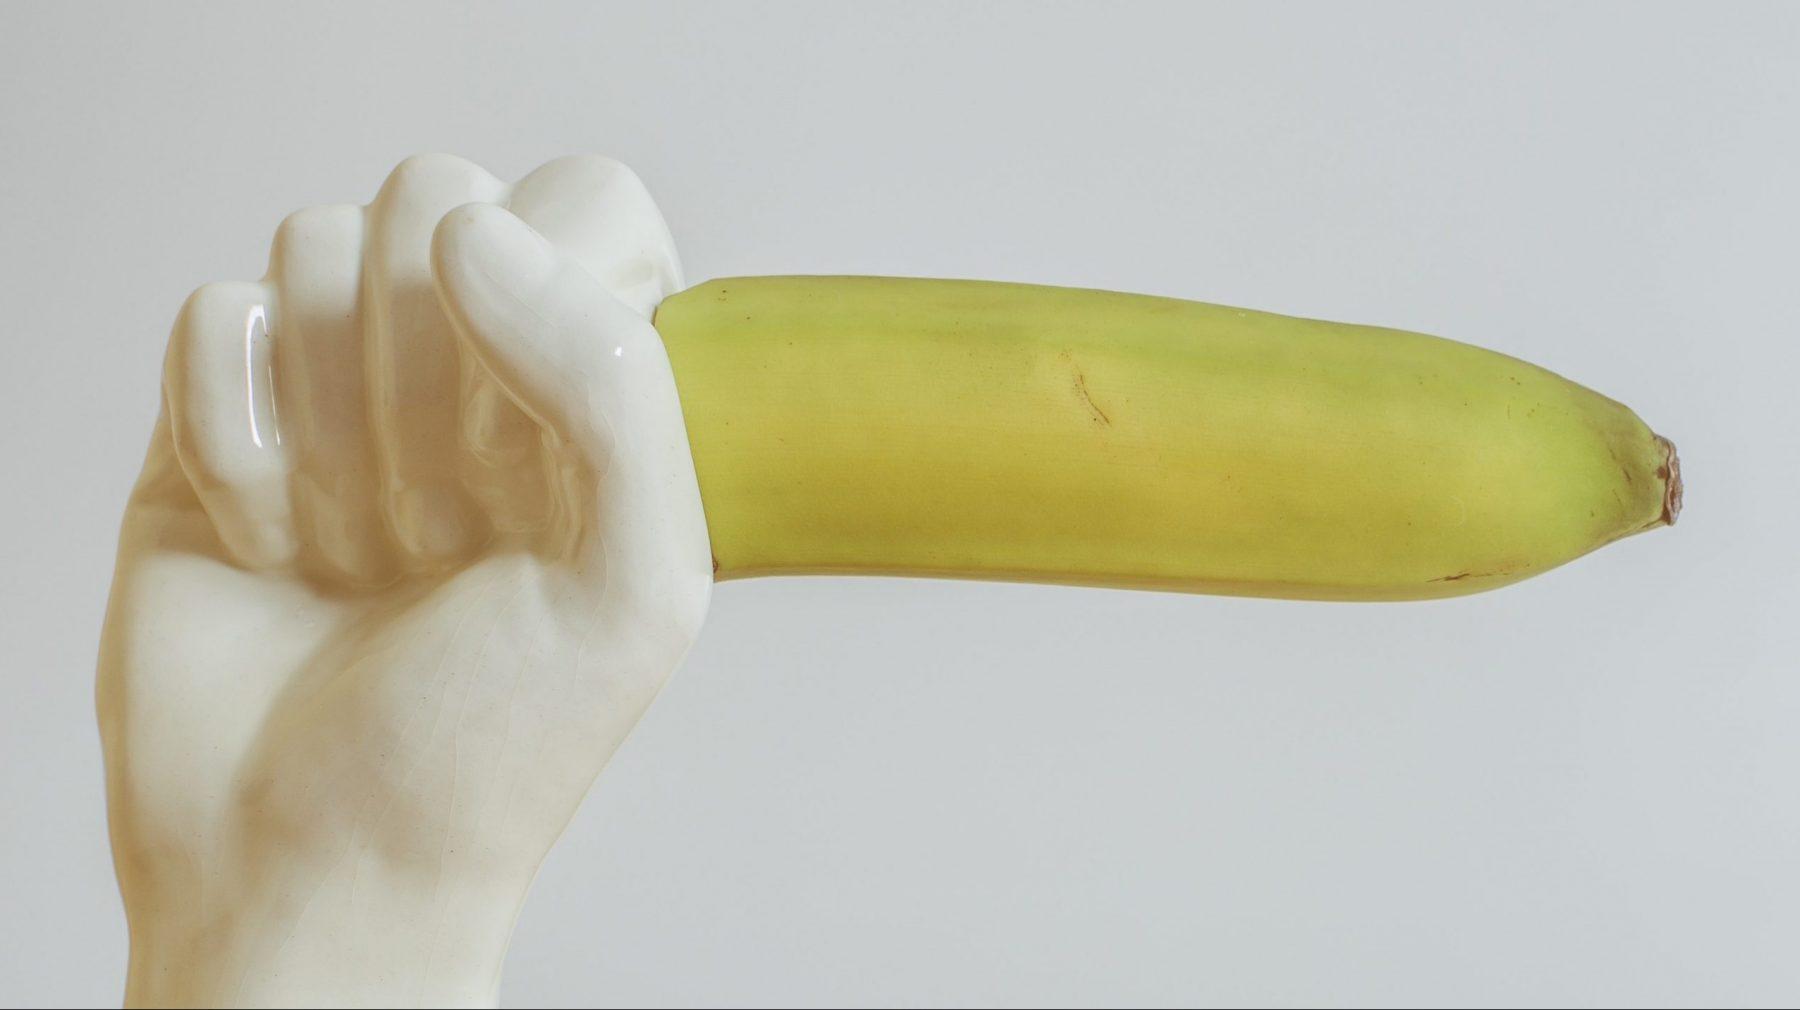 blowjob-banaan